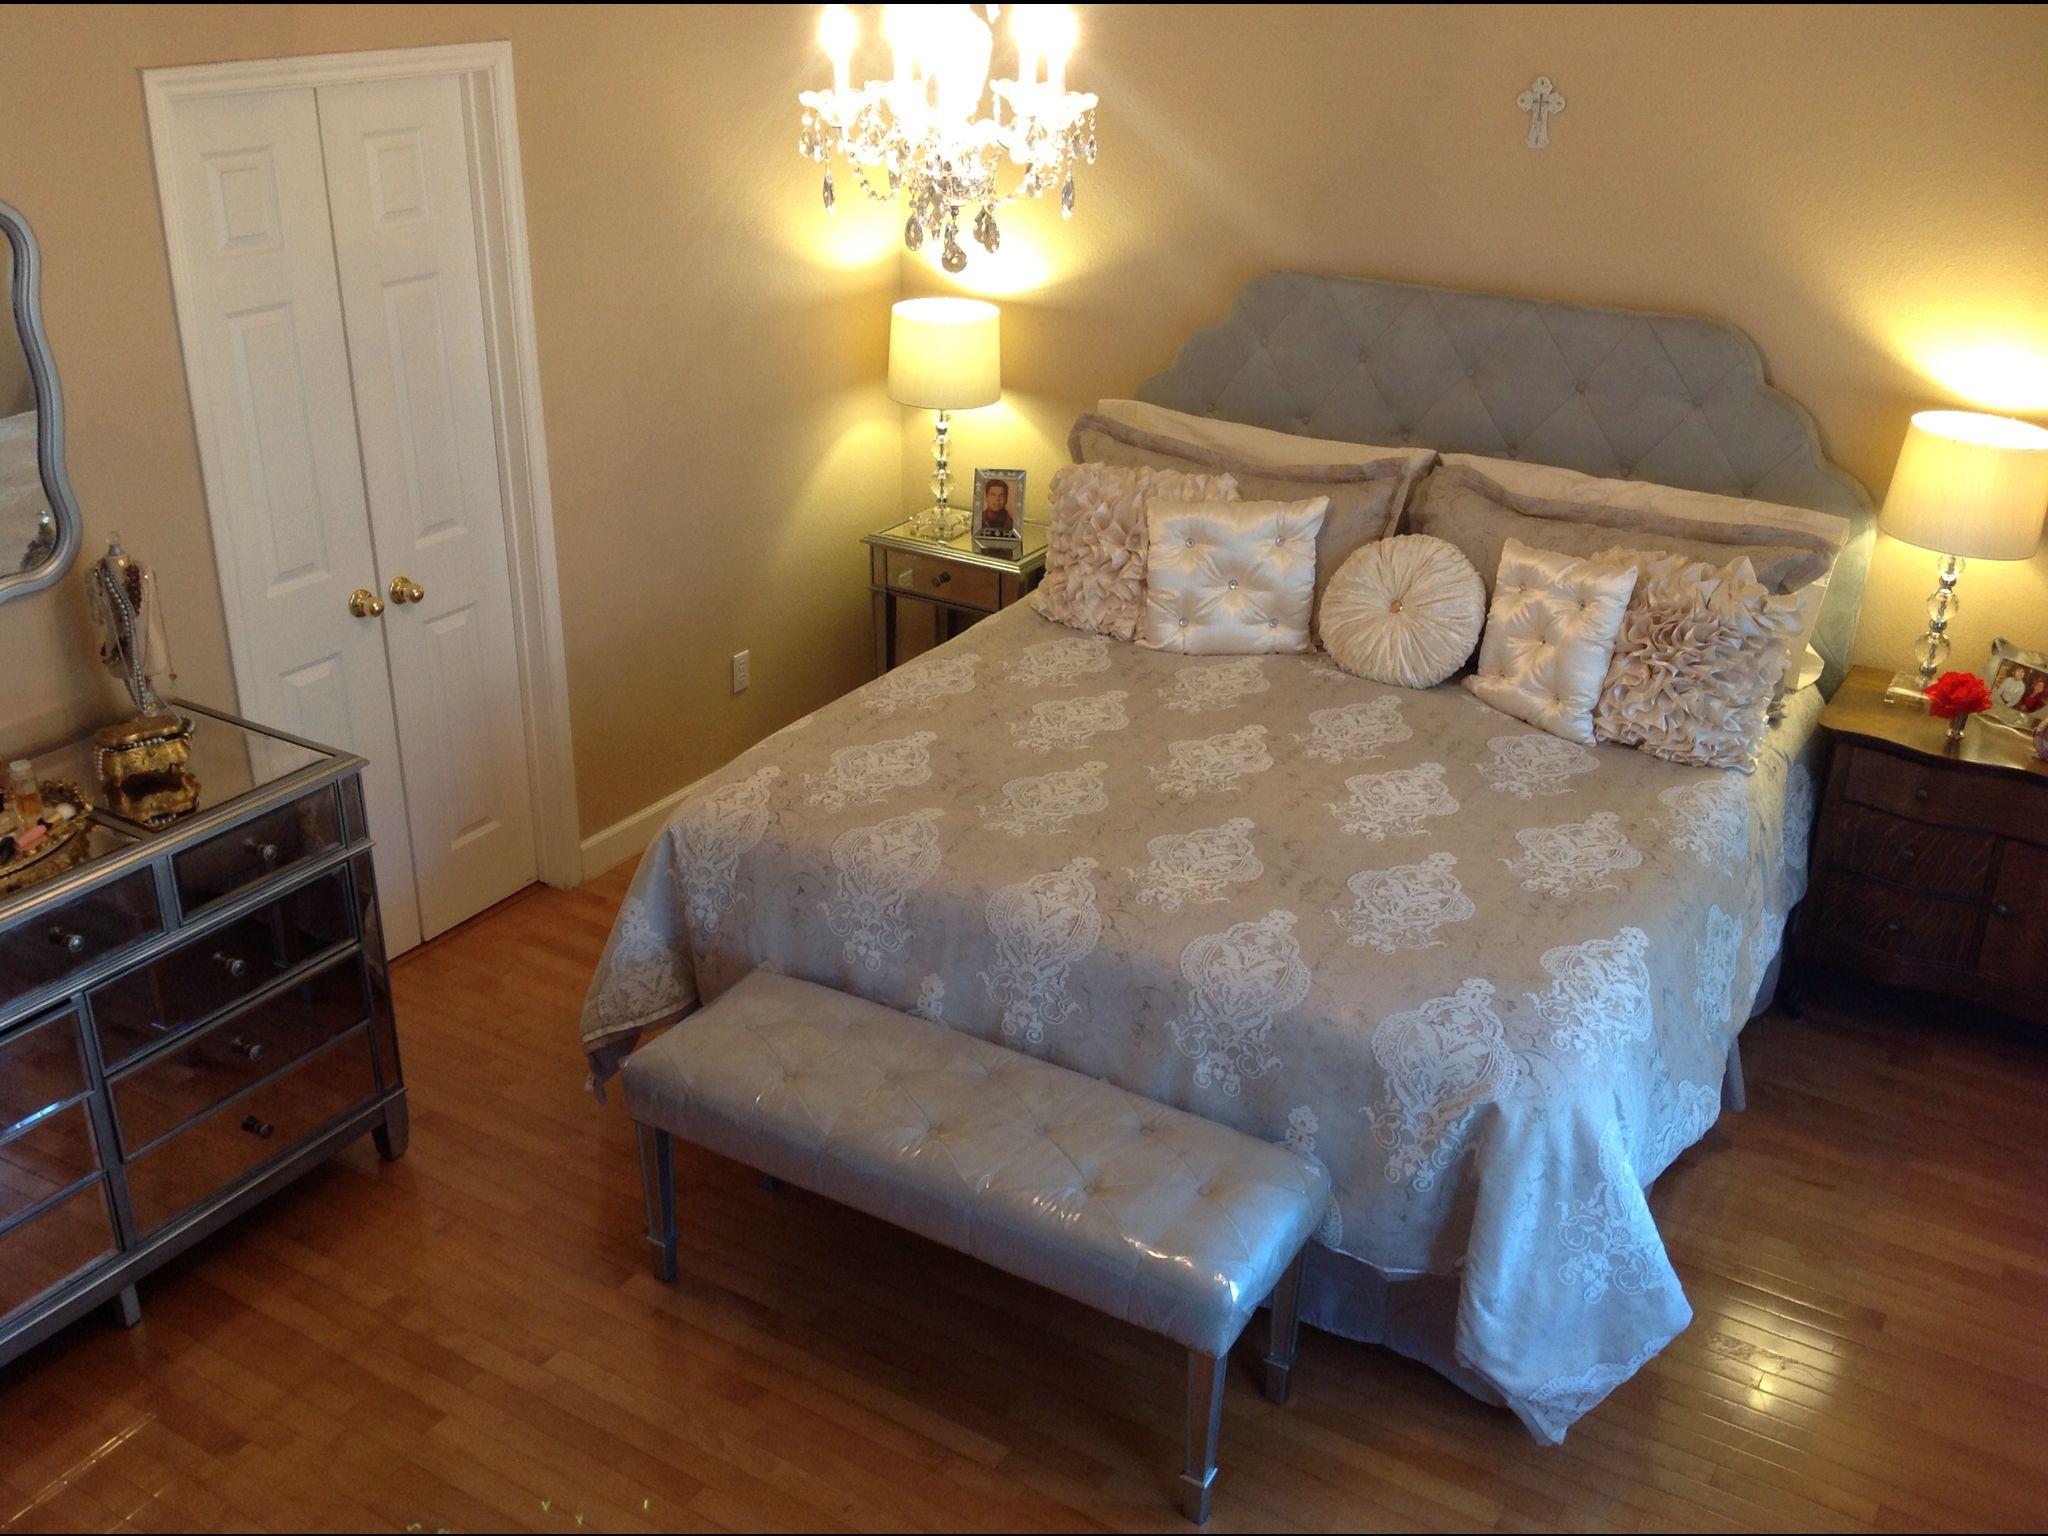 Pinterest Home Decor Ideas: Home Decor/ideas